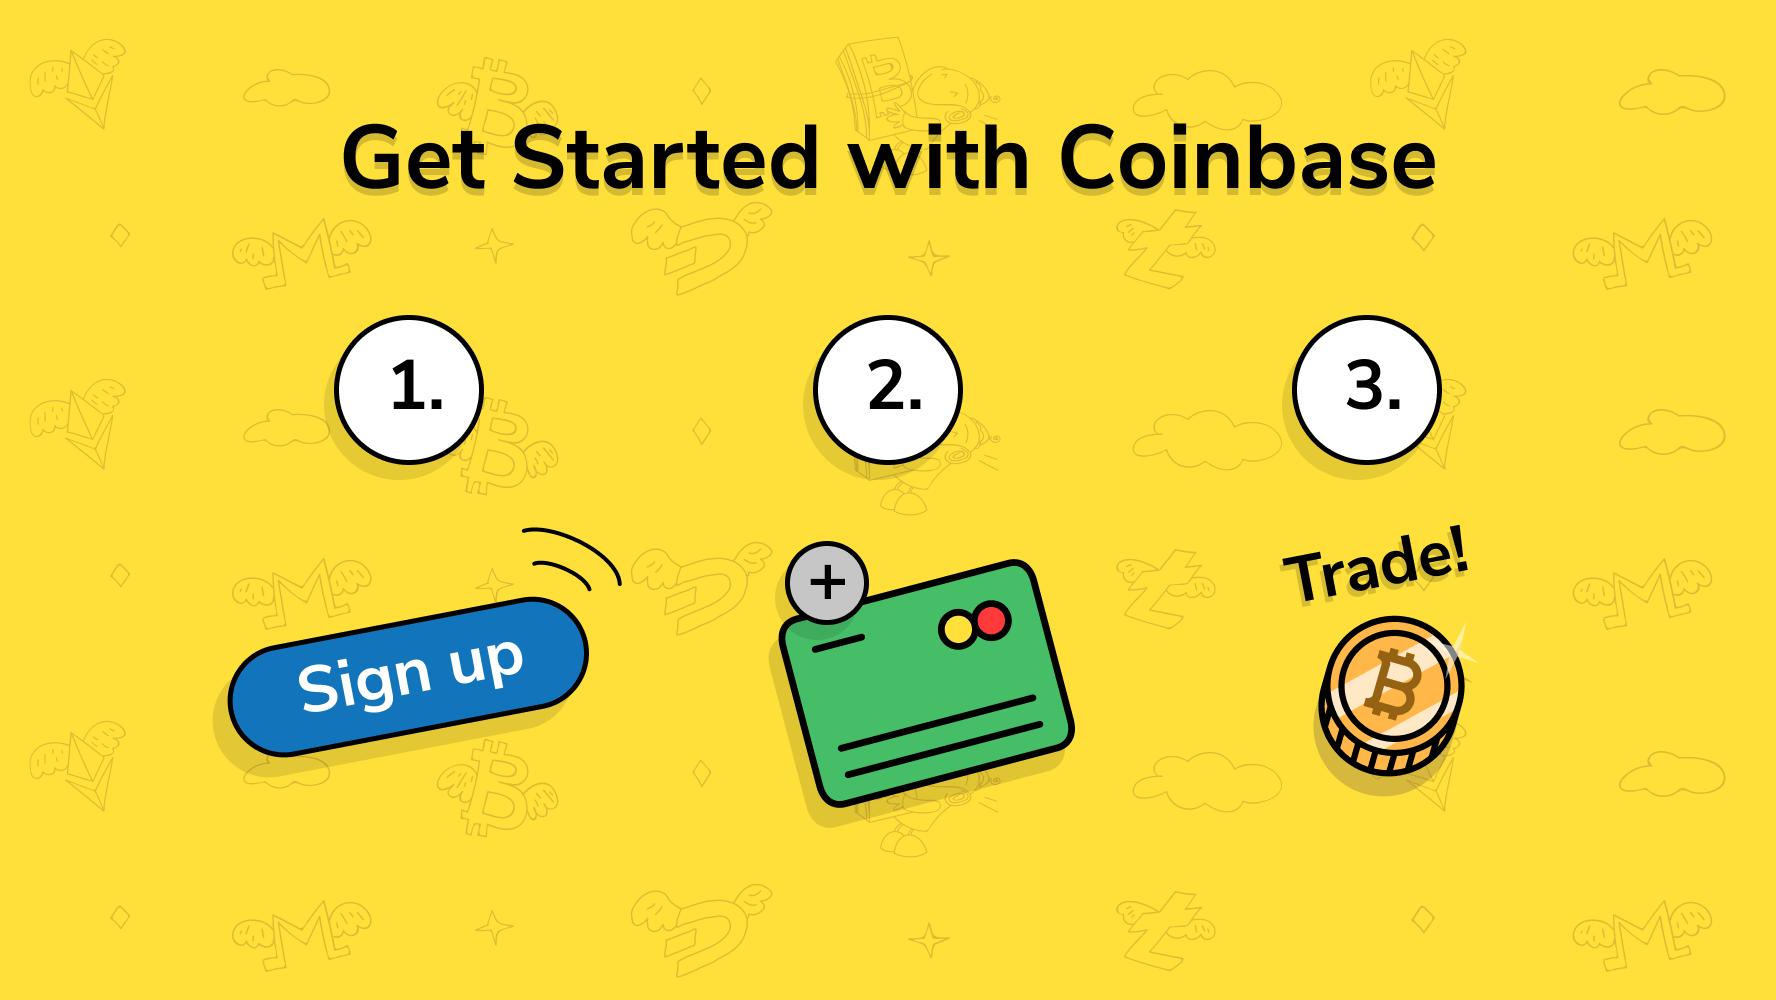 coinbase 1 - Trading On Coinbase Platform 2021